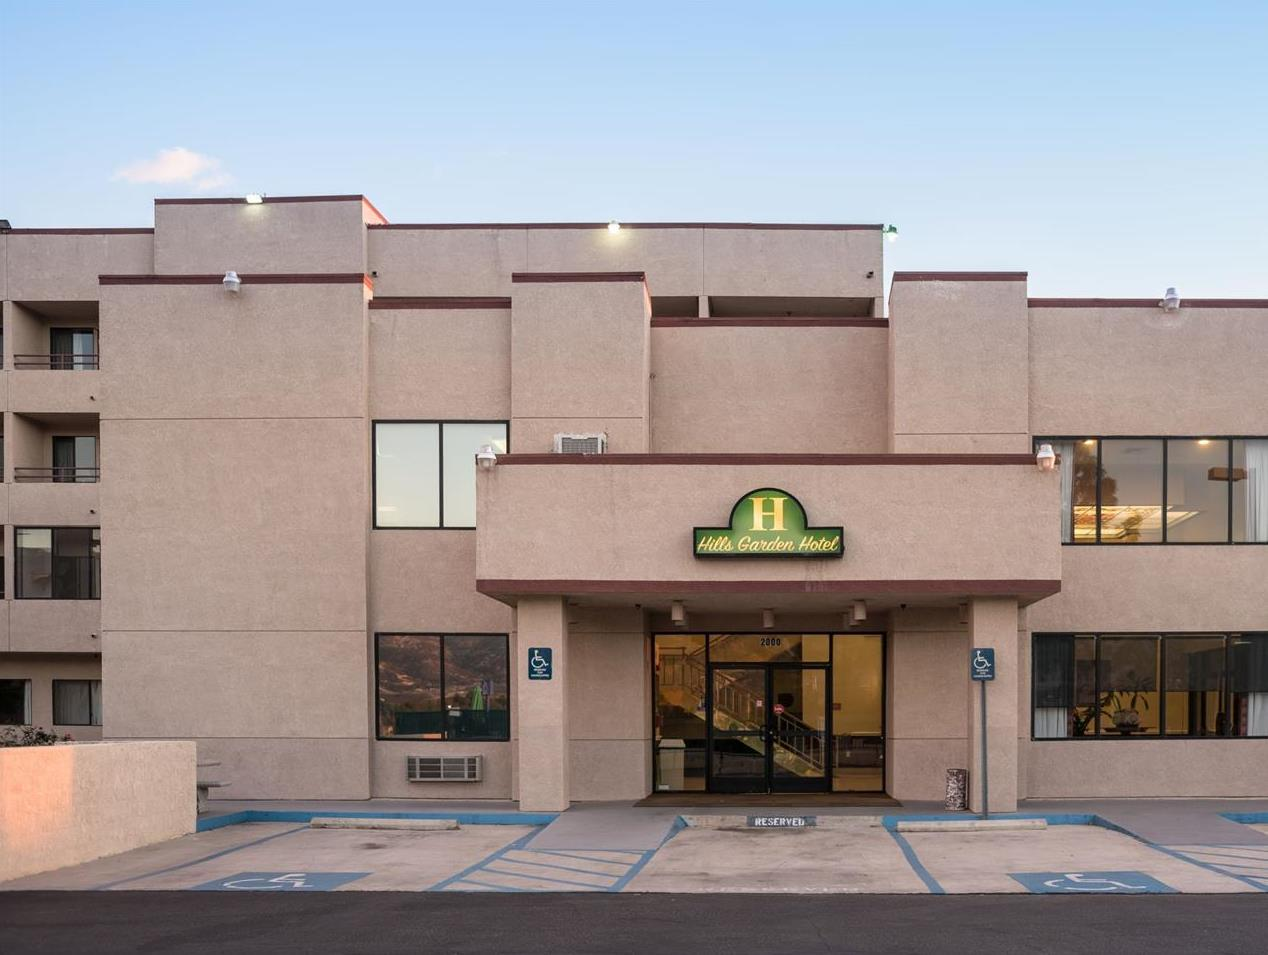 Hills Garden Hotel San Bernardino San Bernardino (CA)